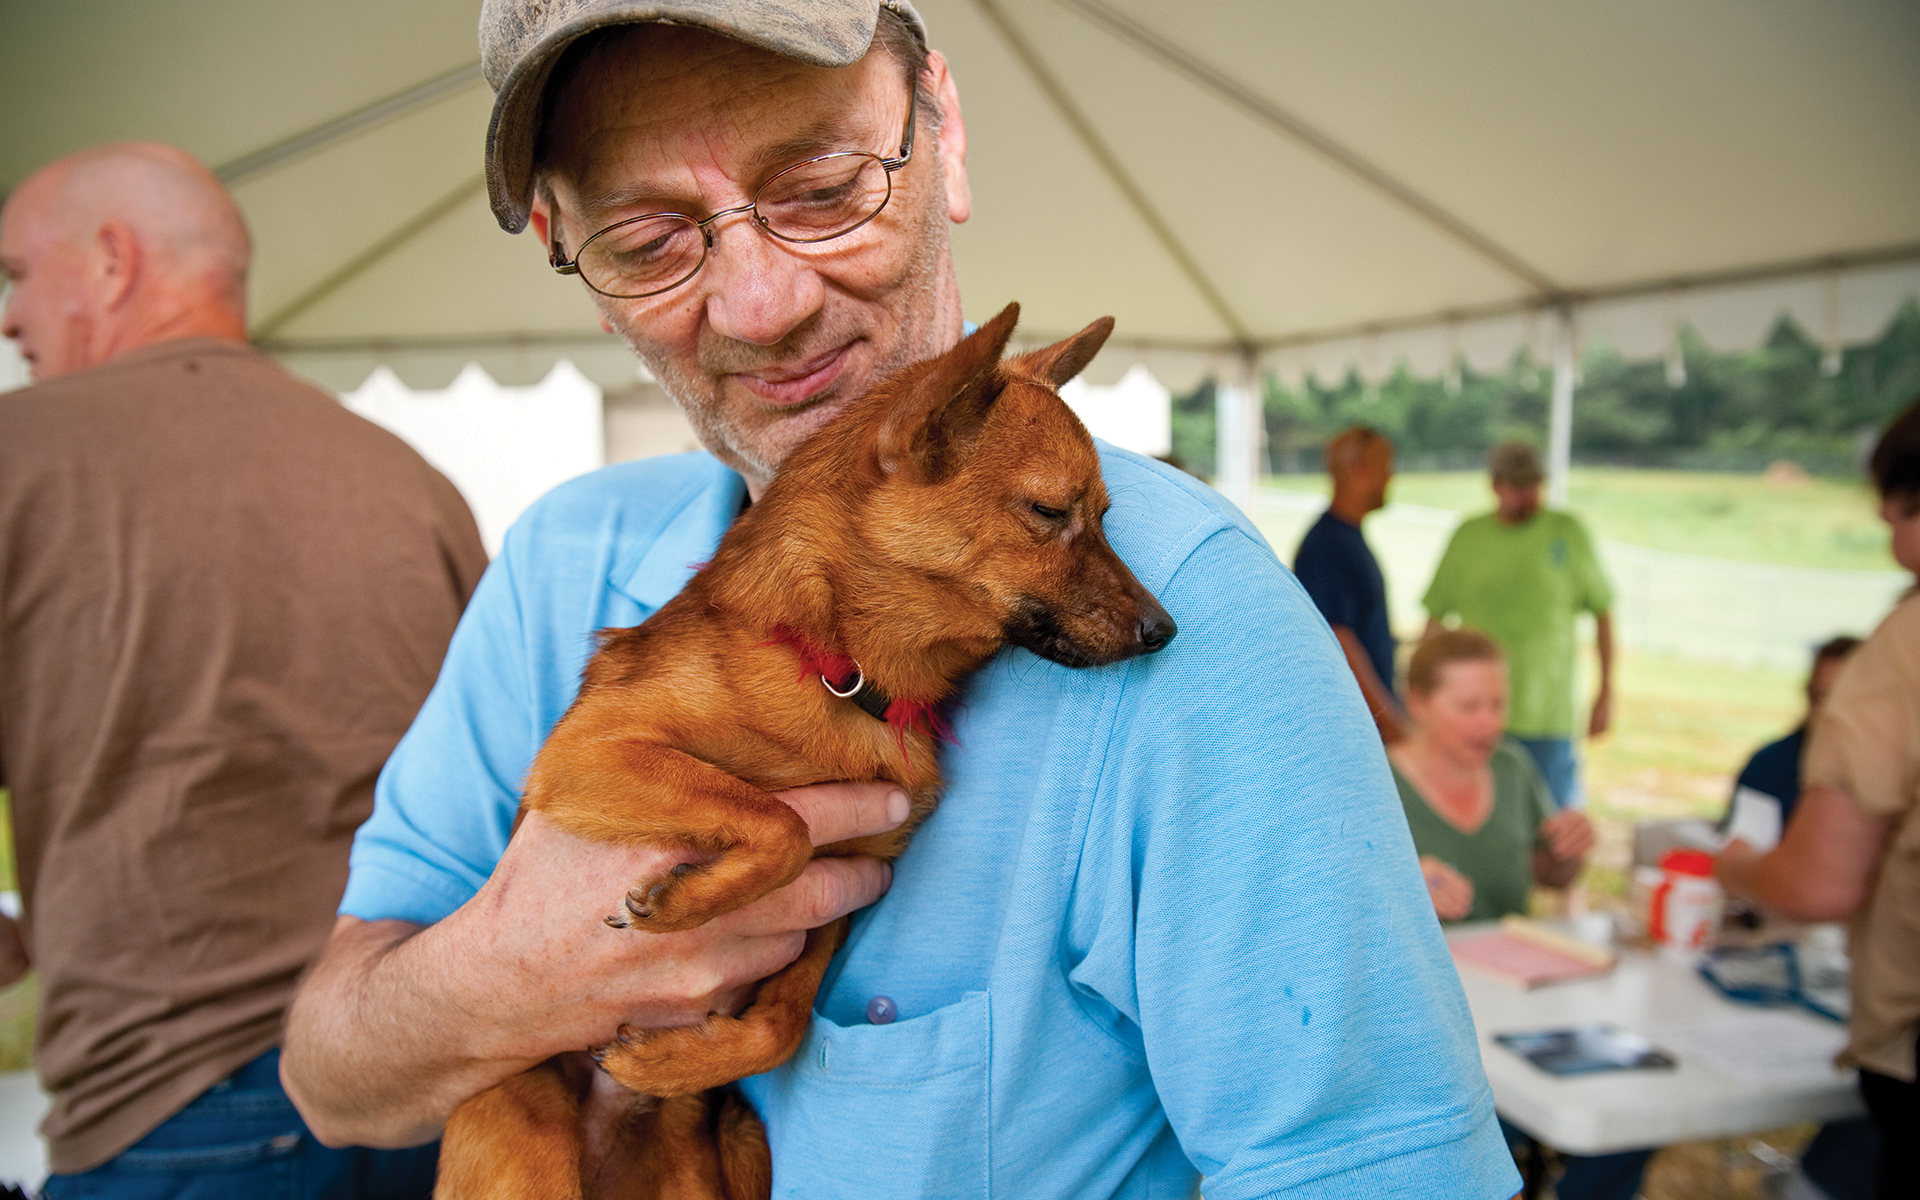 Inclusion = Lifesaving: man with dog